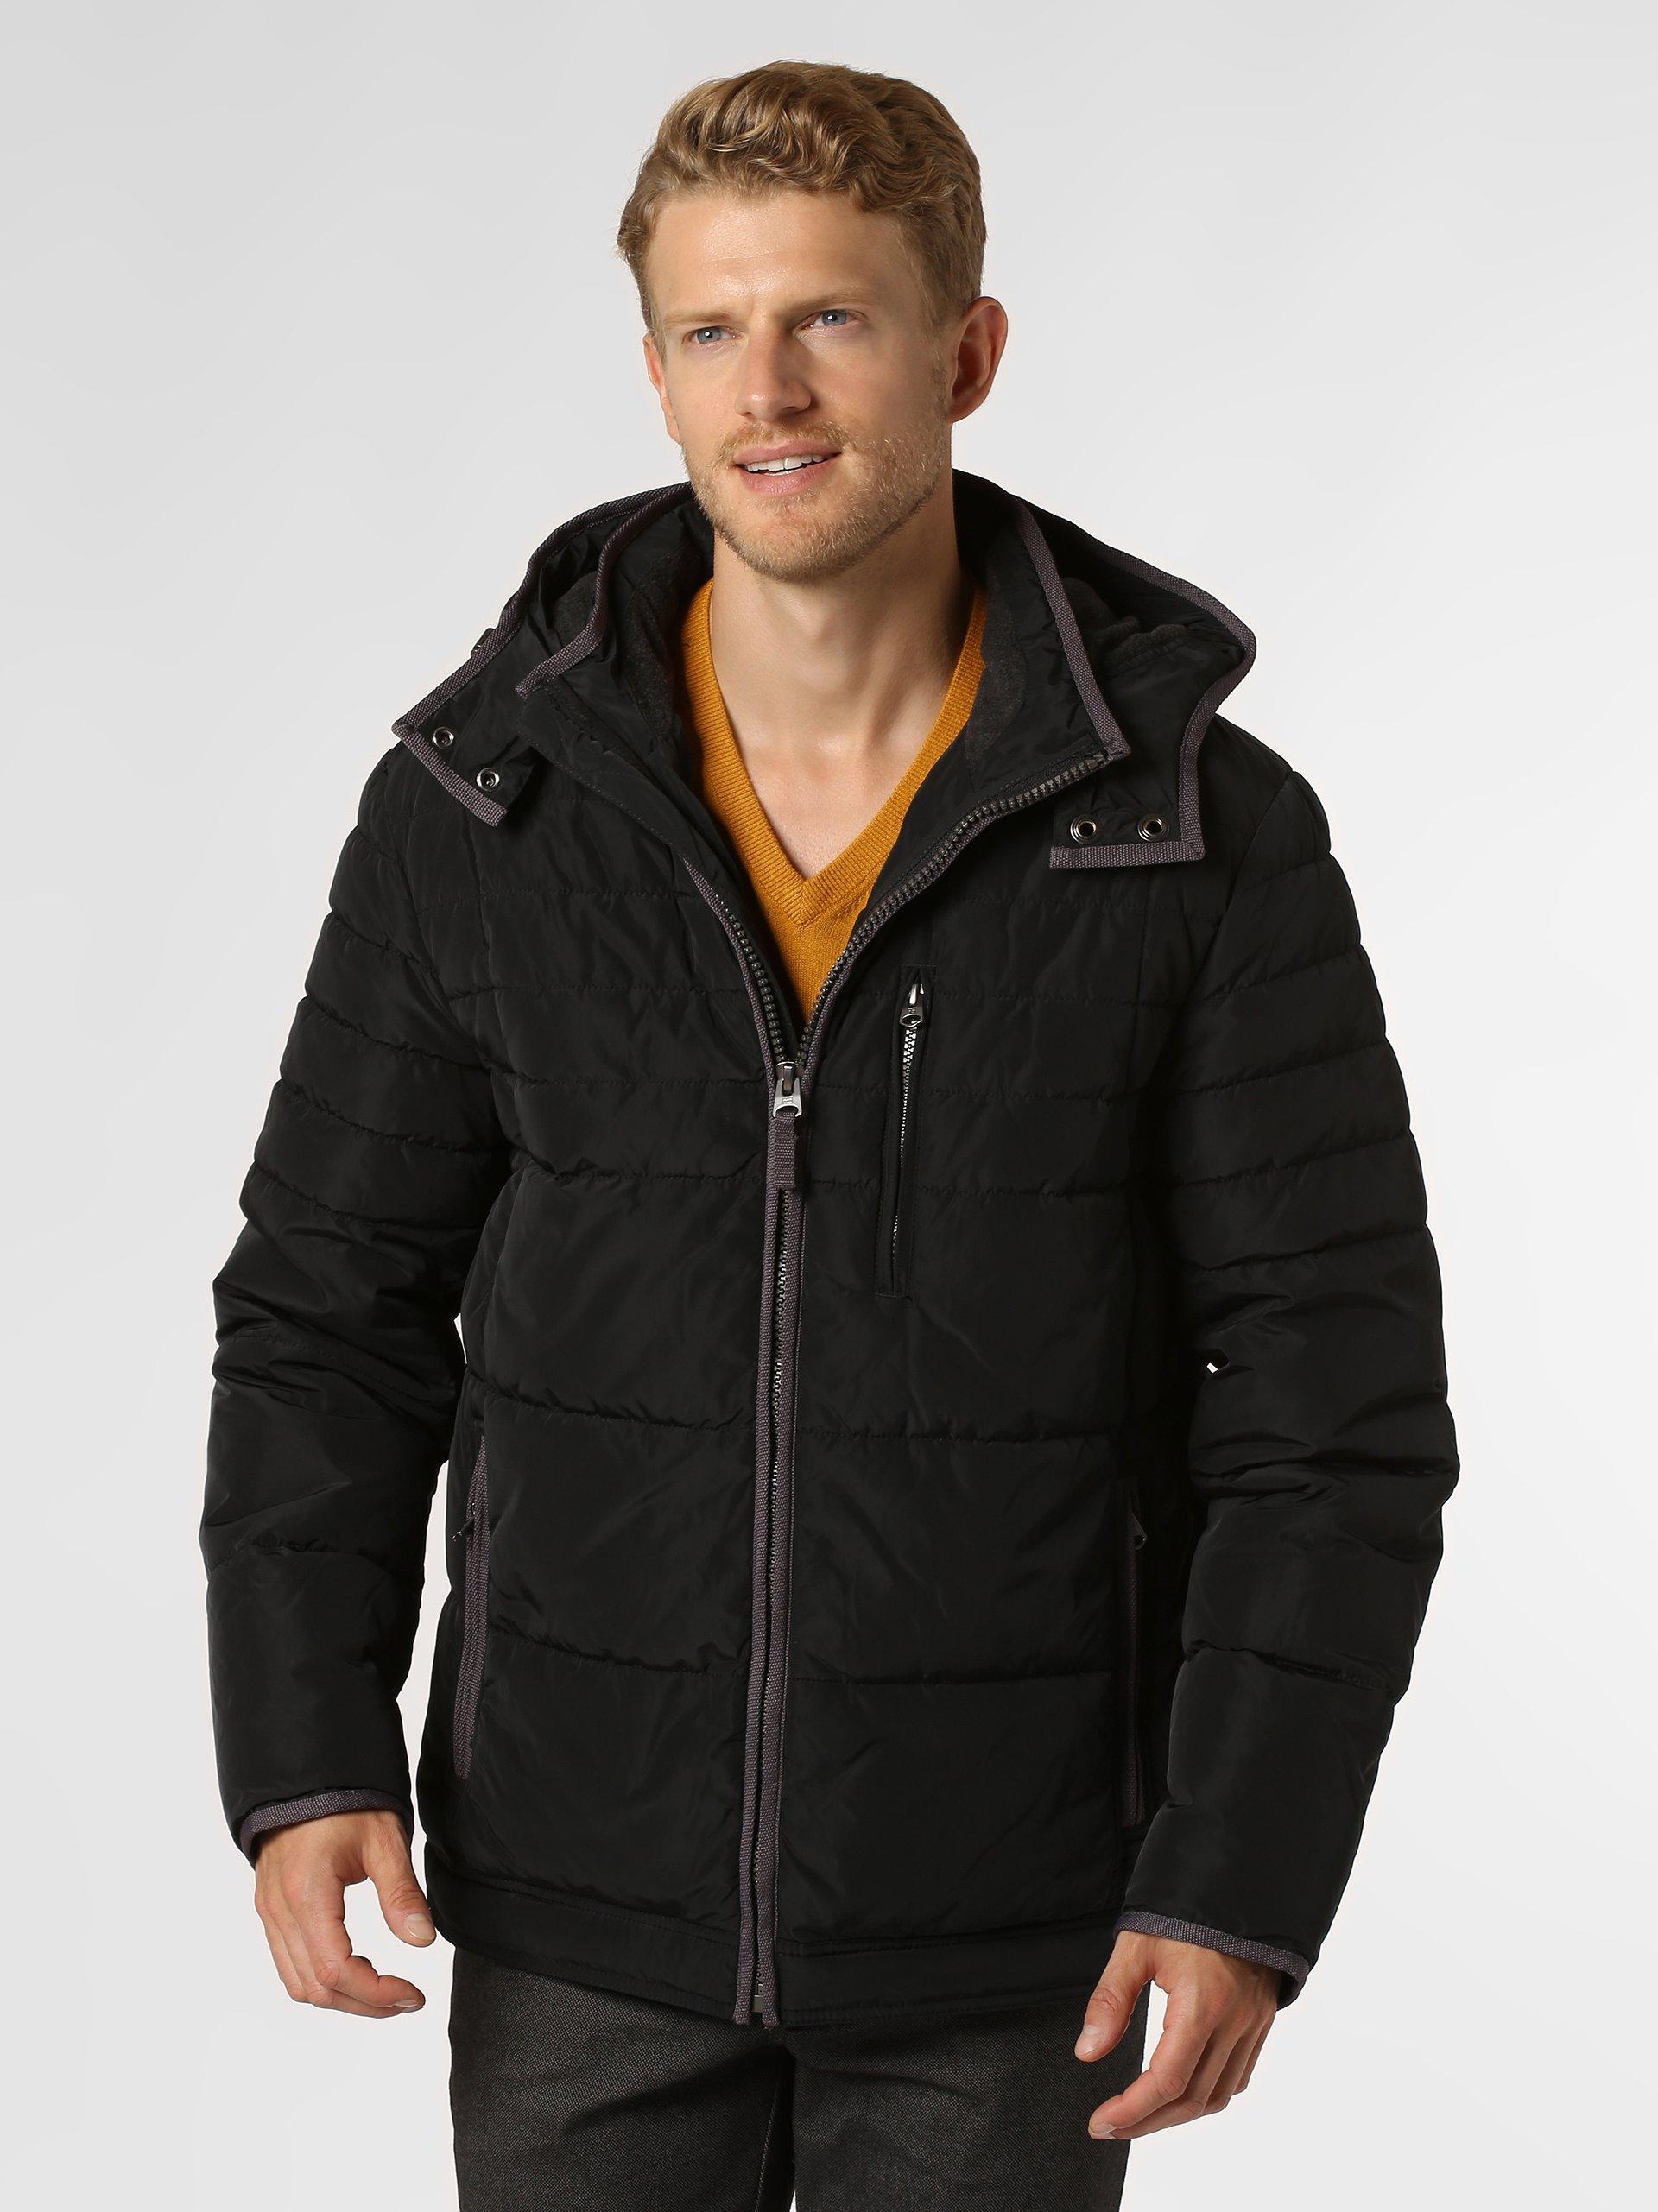 Nils Sundström Męska kurtka pikowana